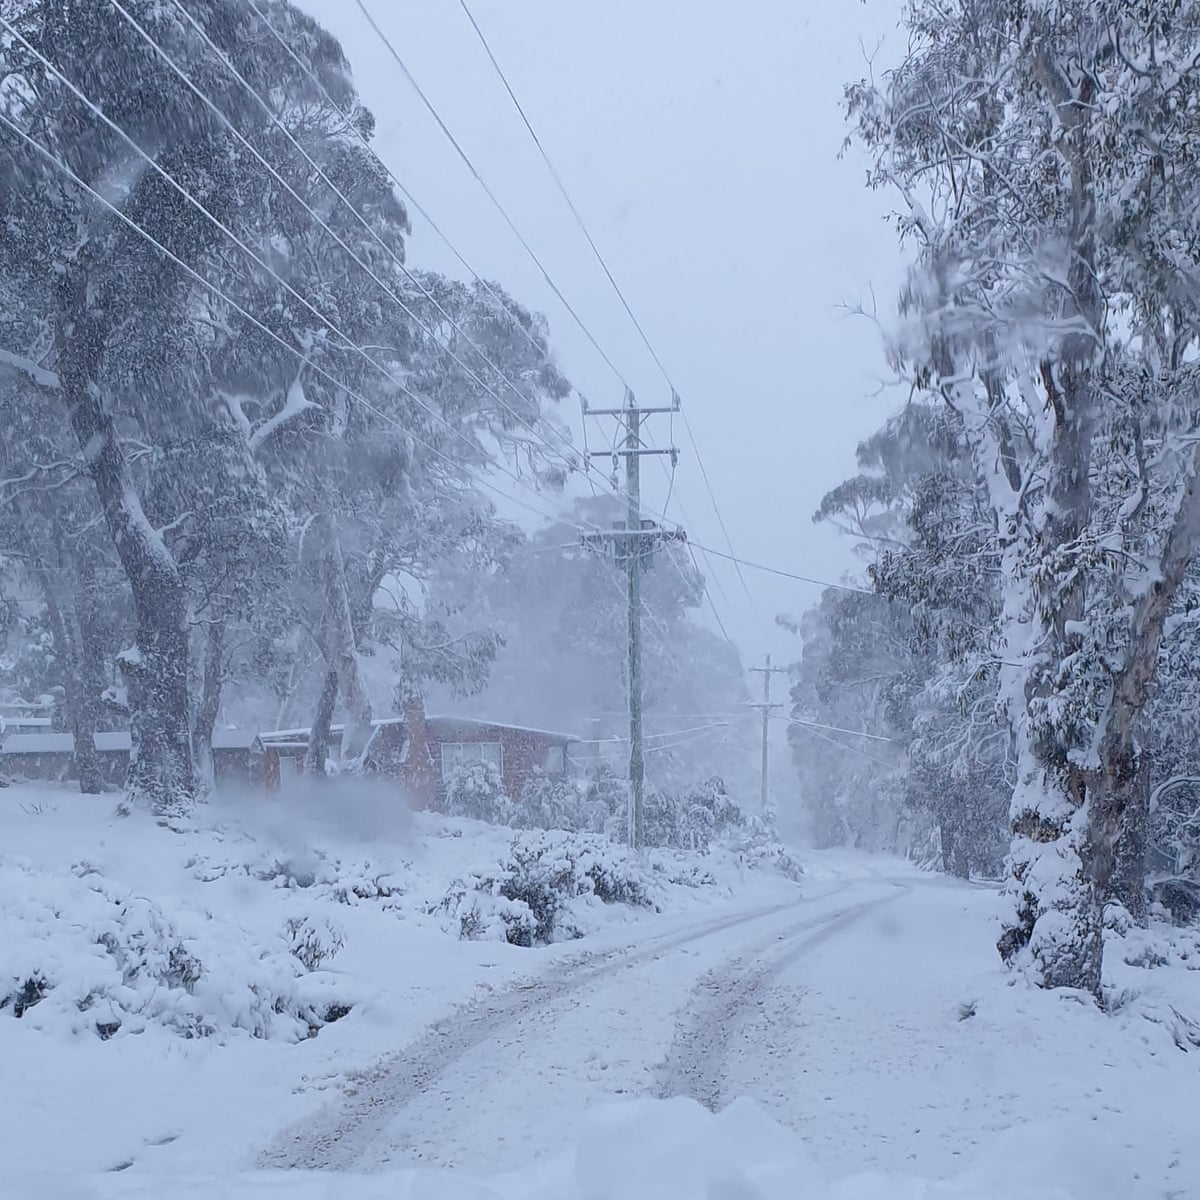 Spring Snow Blankets Parts Of Tasmania A Week After Bushfires Raged Tasmania The Guardian